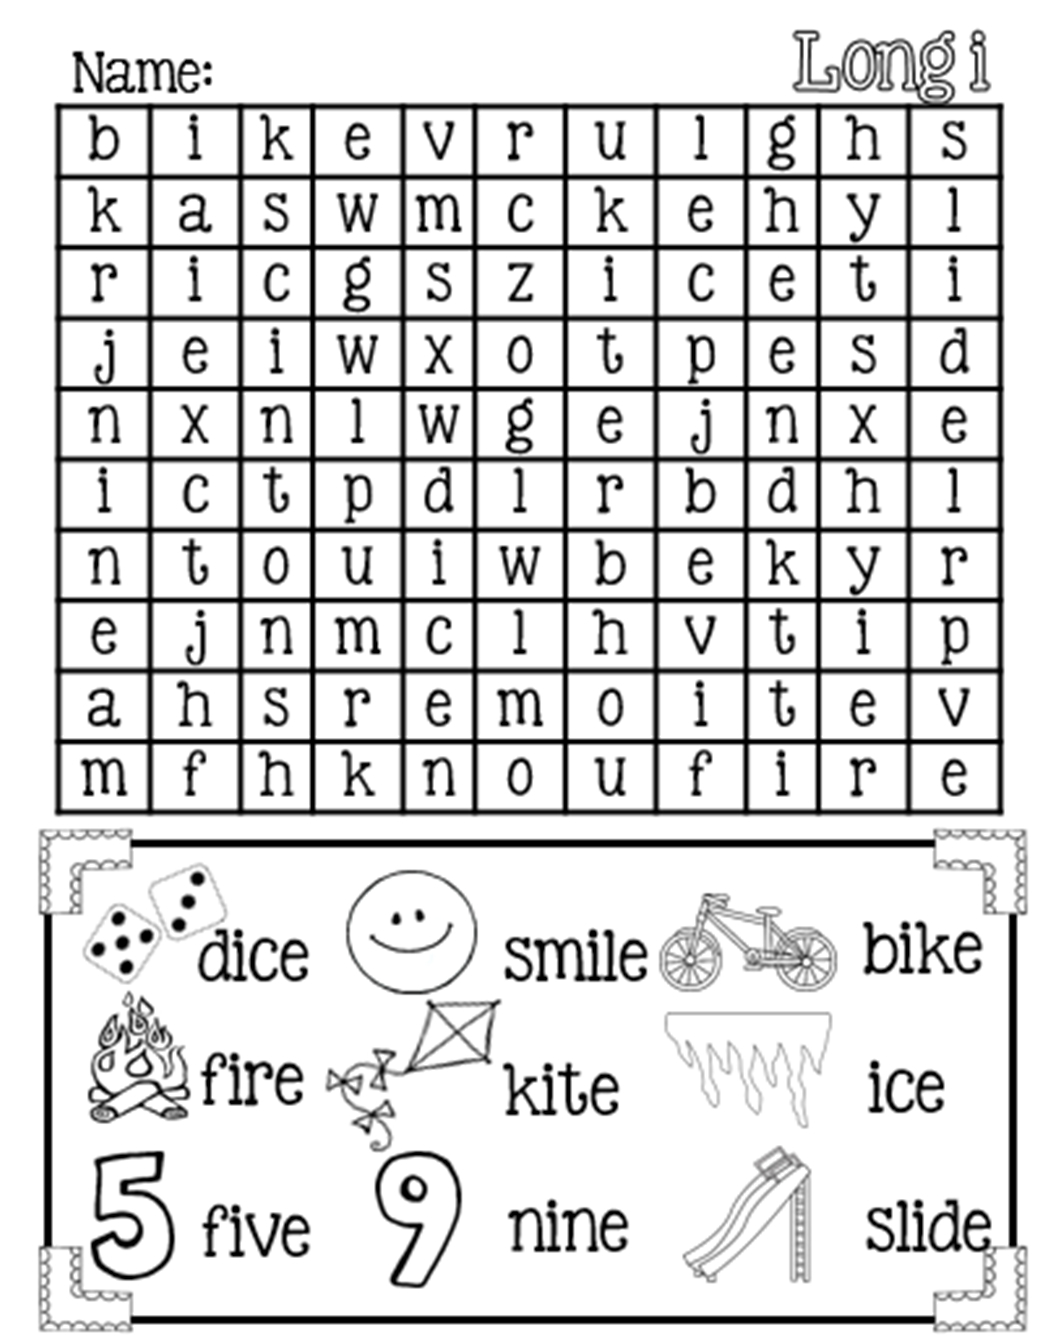 Magic E Worksheets Free Printable